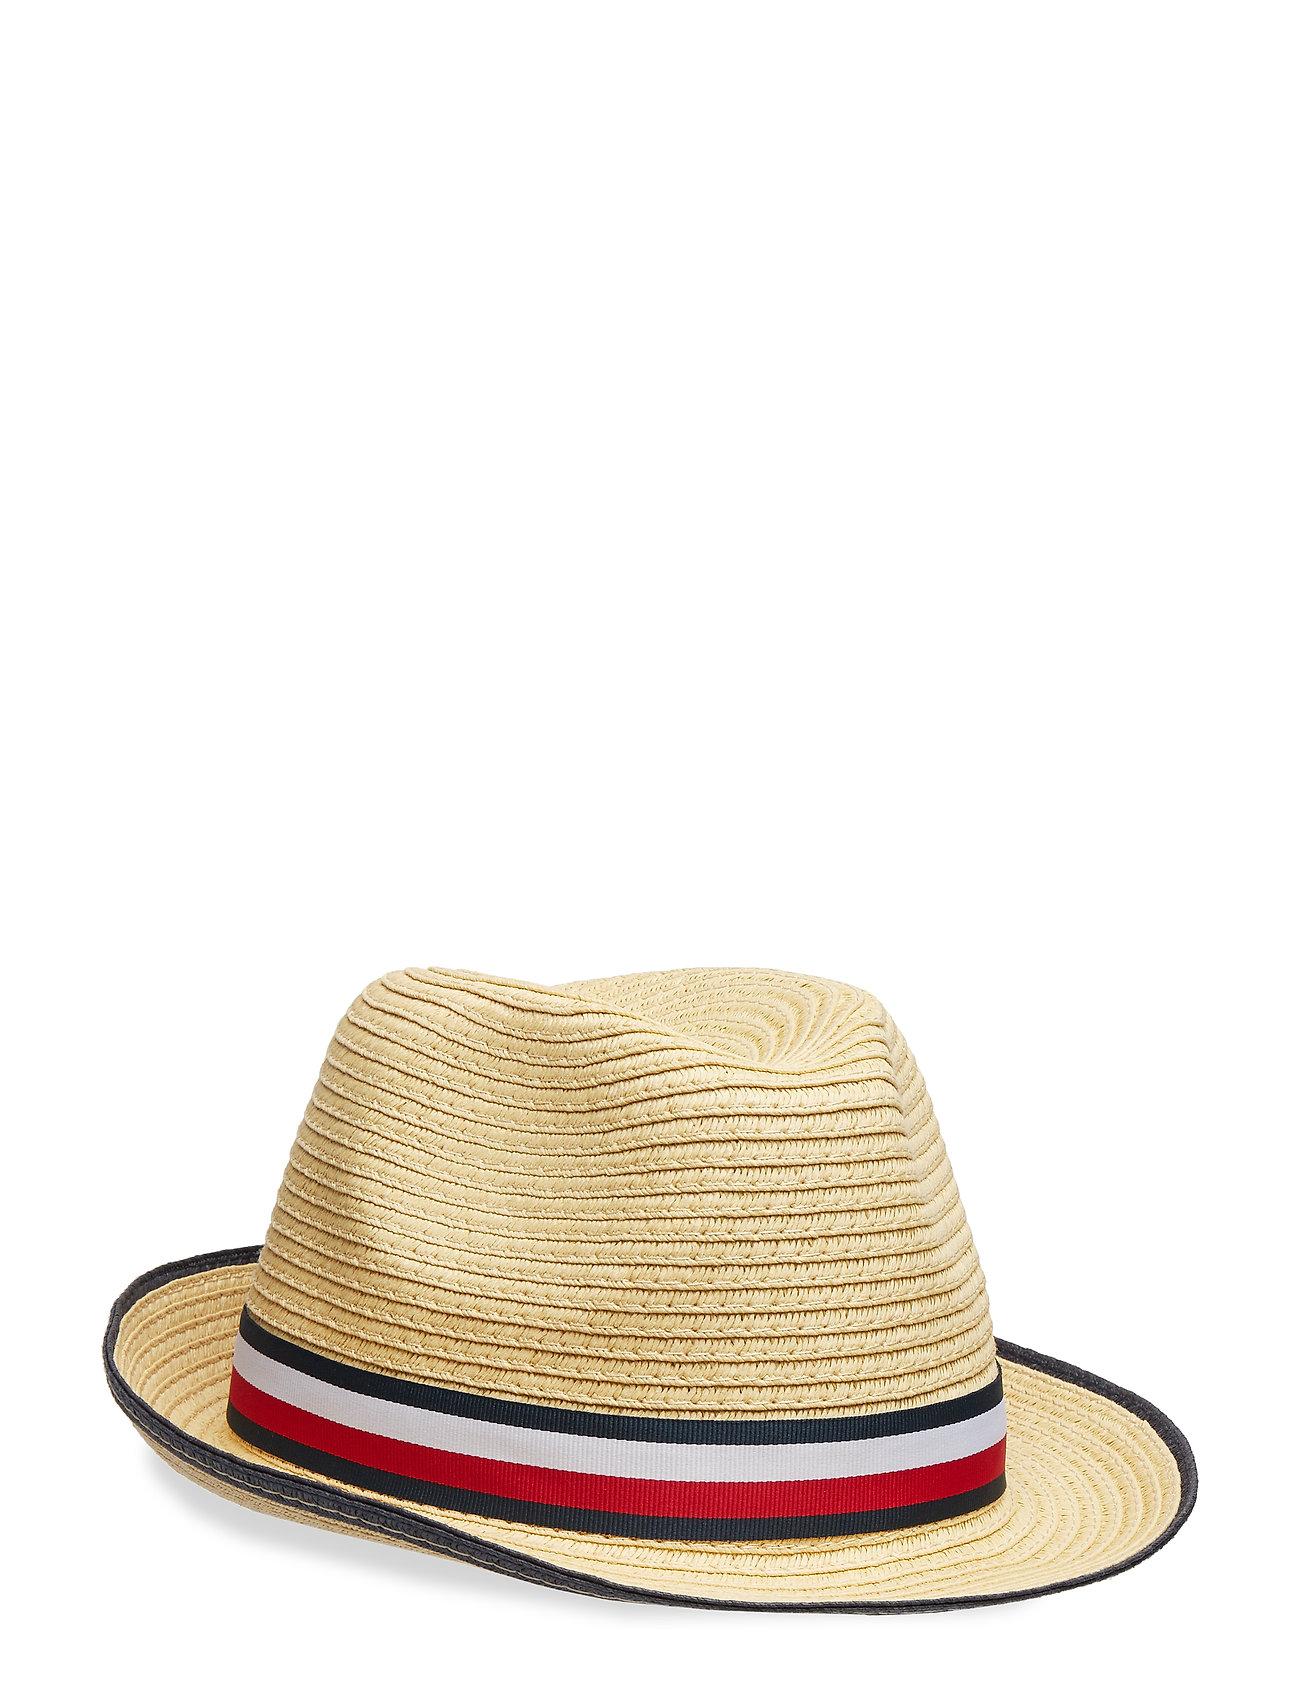 Tommy Hilfiger BOYS STRAW HAT - NATURAL